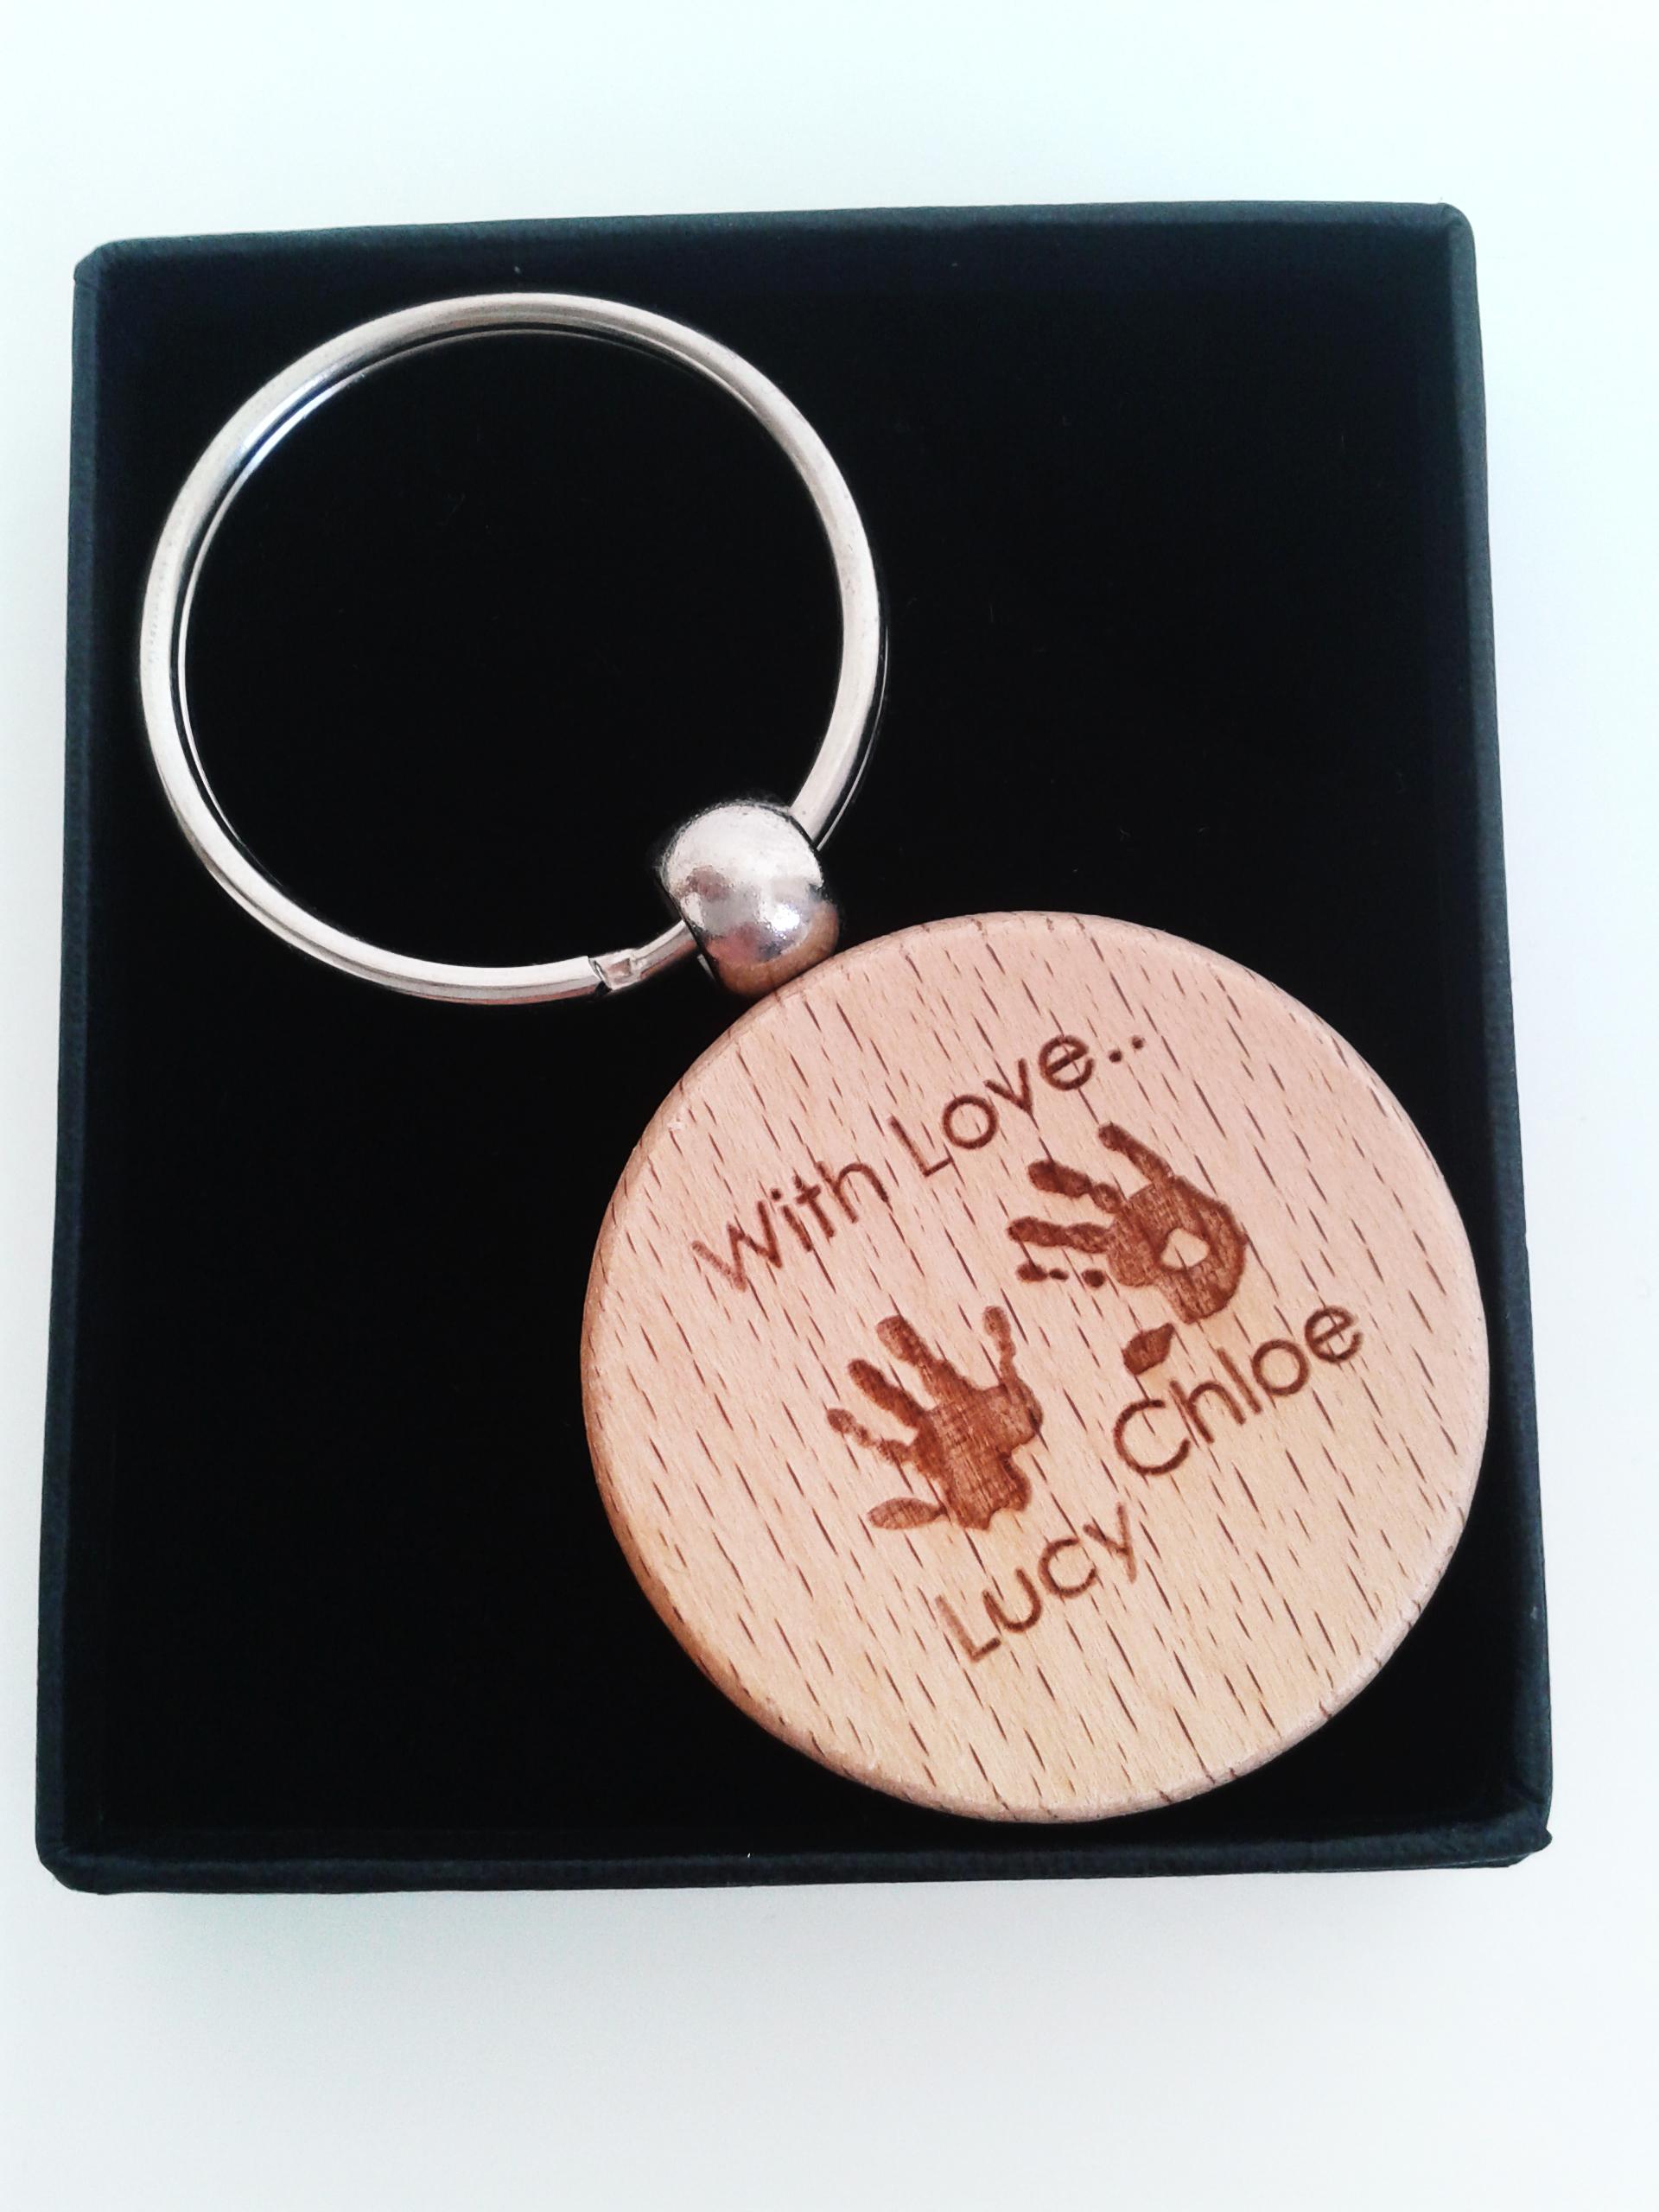 key rind baby handprints.jpg